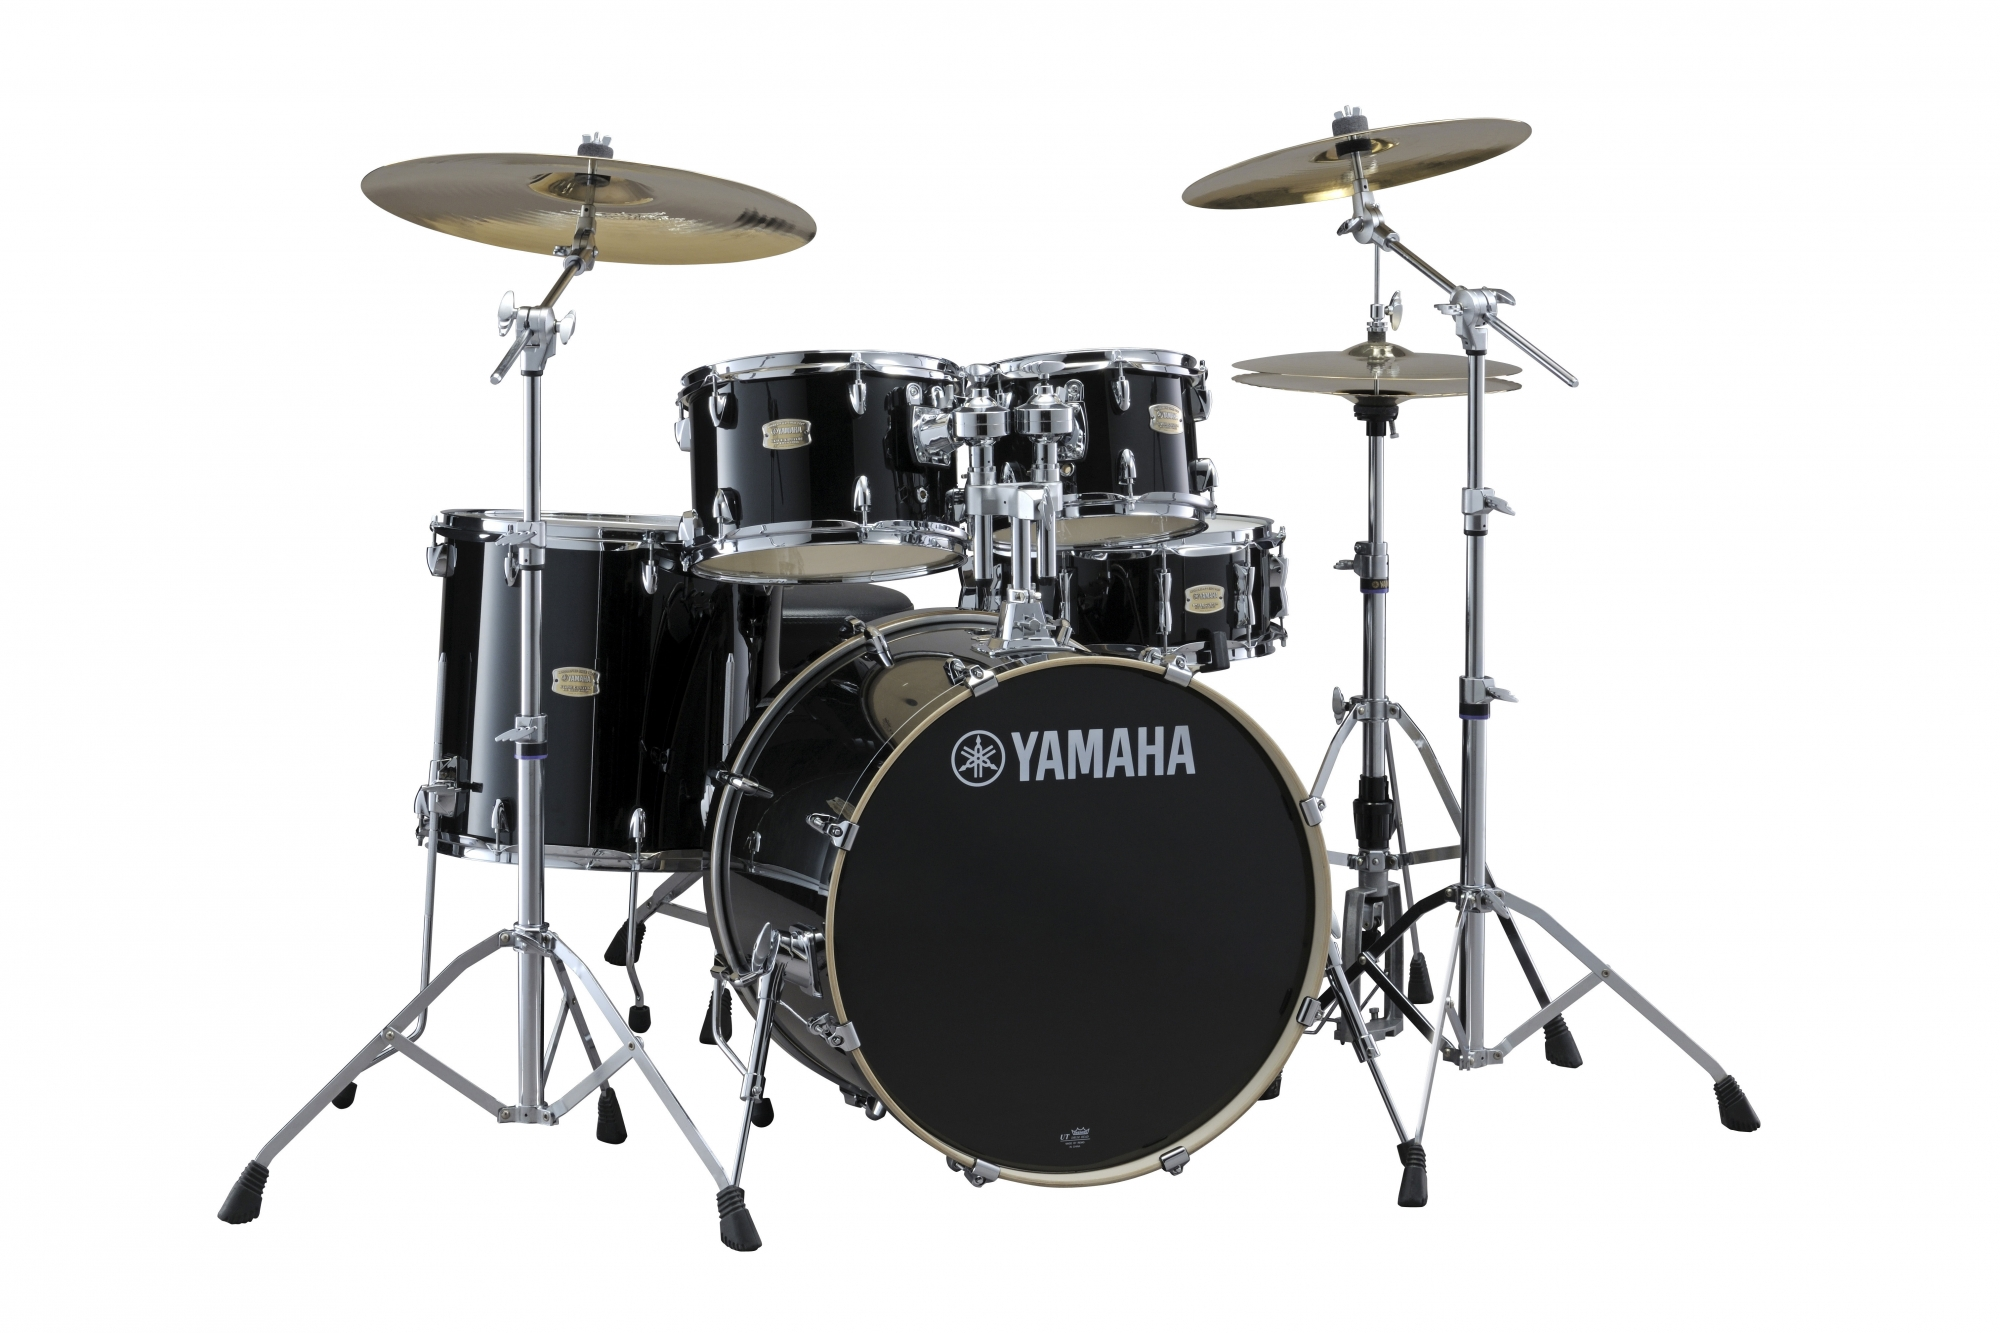 Yamaha Stage Custom Birch Standard Trommesæt Raven Black